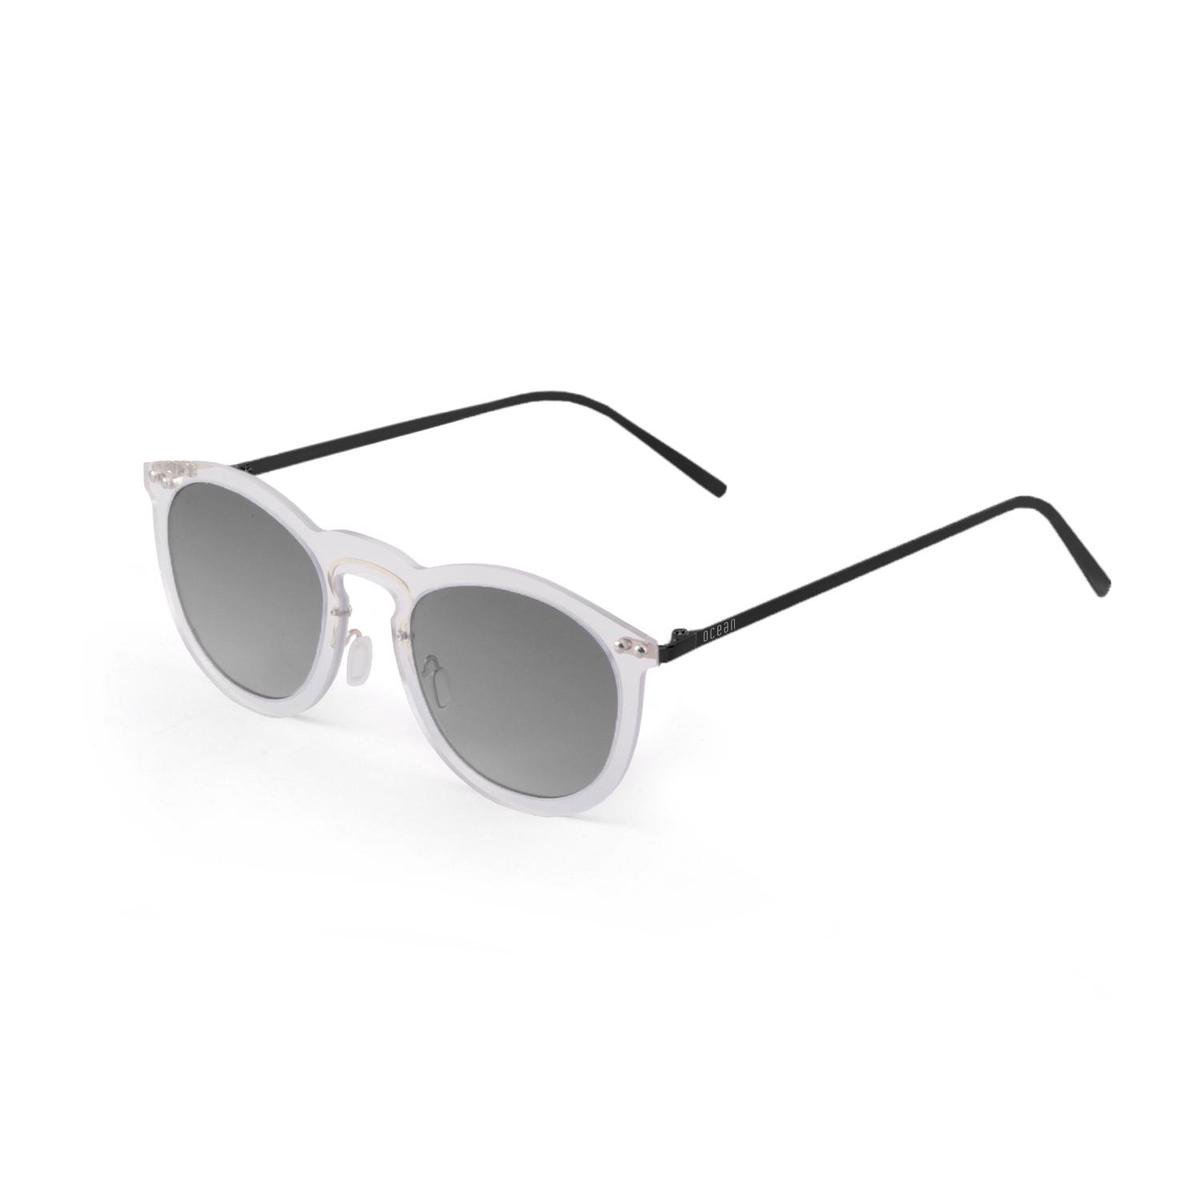 Ocean Sunglasses - Zonnebril - Unisex - 20-27_BERLIN_TRANSPARENTWHITE-SMOKE - Ocean Sunglasses